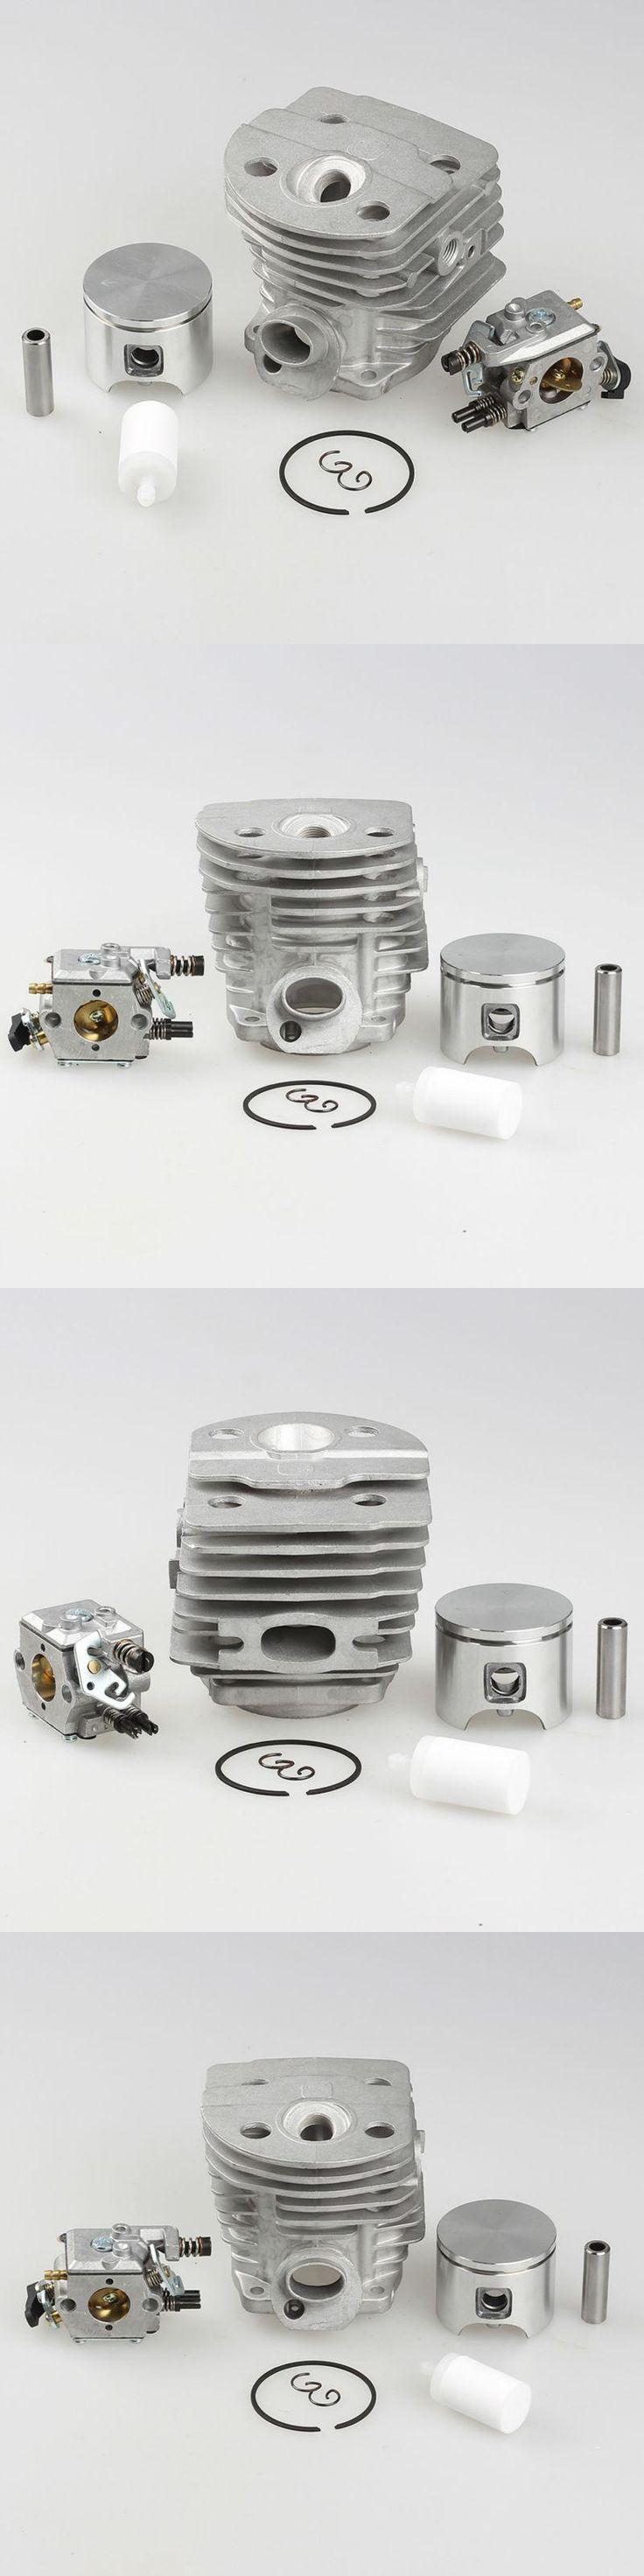 New 46mm Cylinder Piston Kits for Husqvarna 55 51 Walbro Carburetor Fuel Filter Chainsaw parts # 503 60 91-71